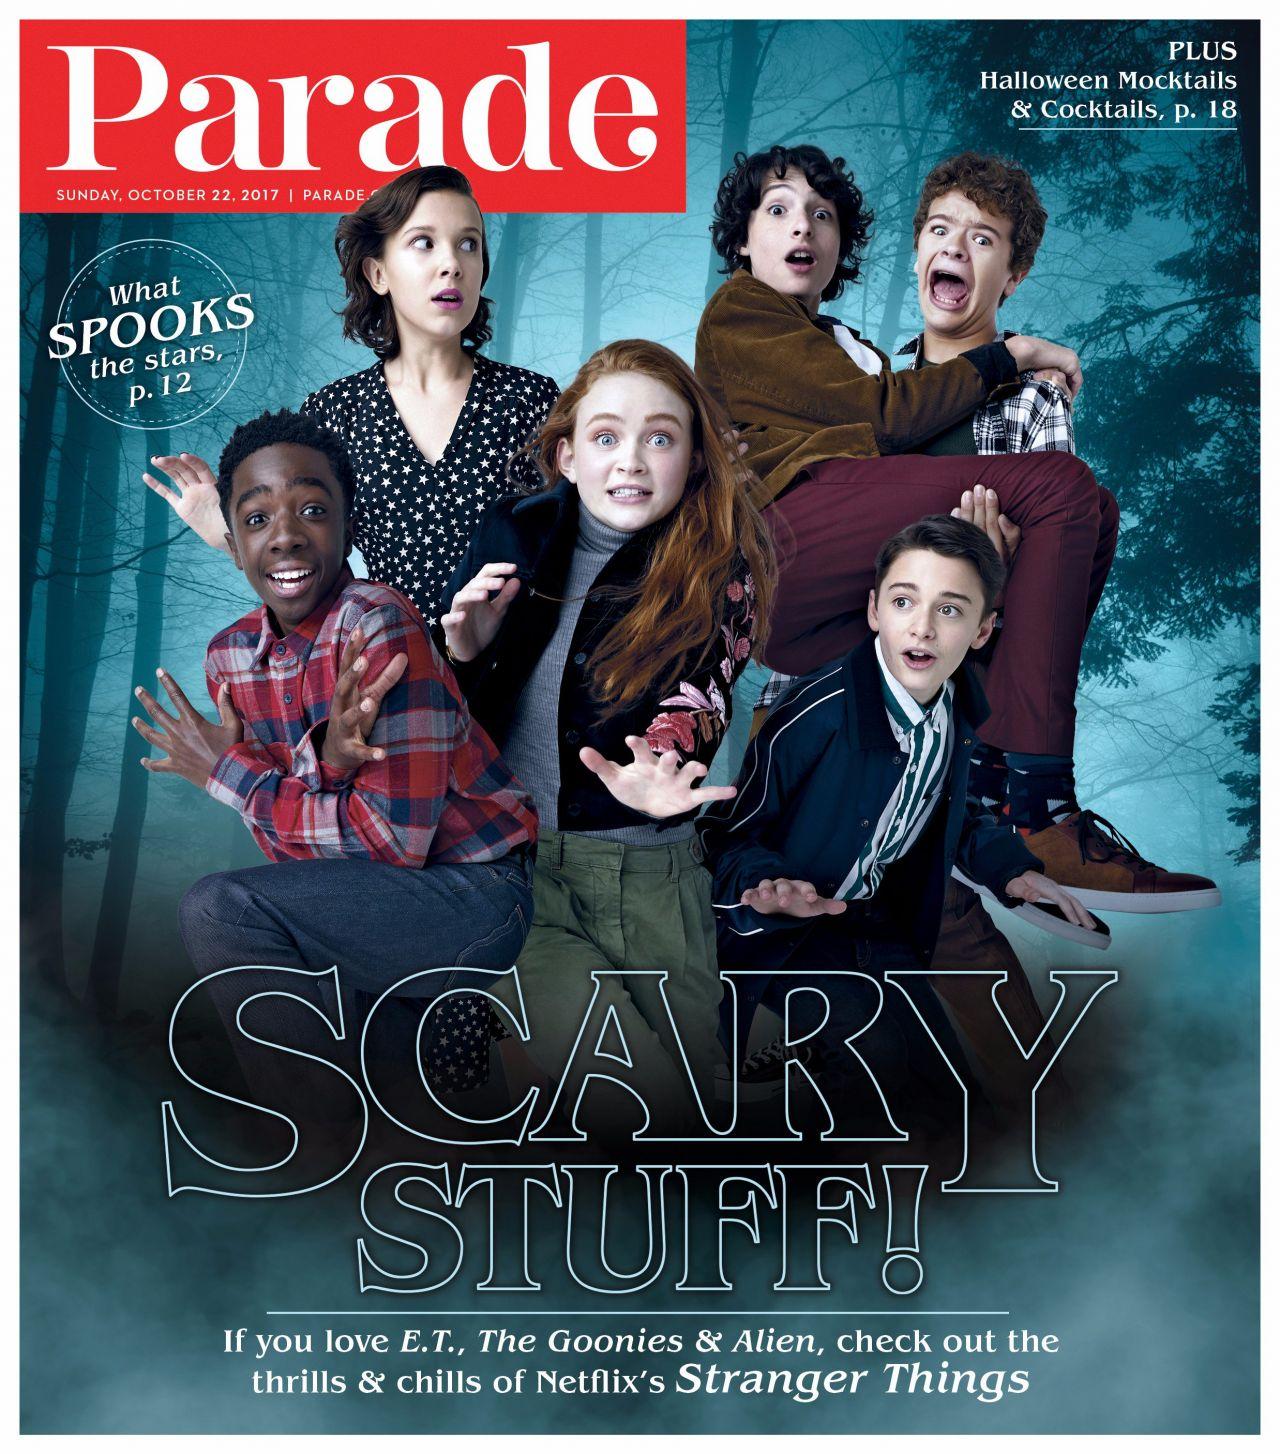 Millie Bobby Brow and Sadie Sink - Parade Magazine October 22, 2017